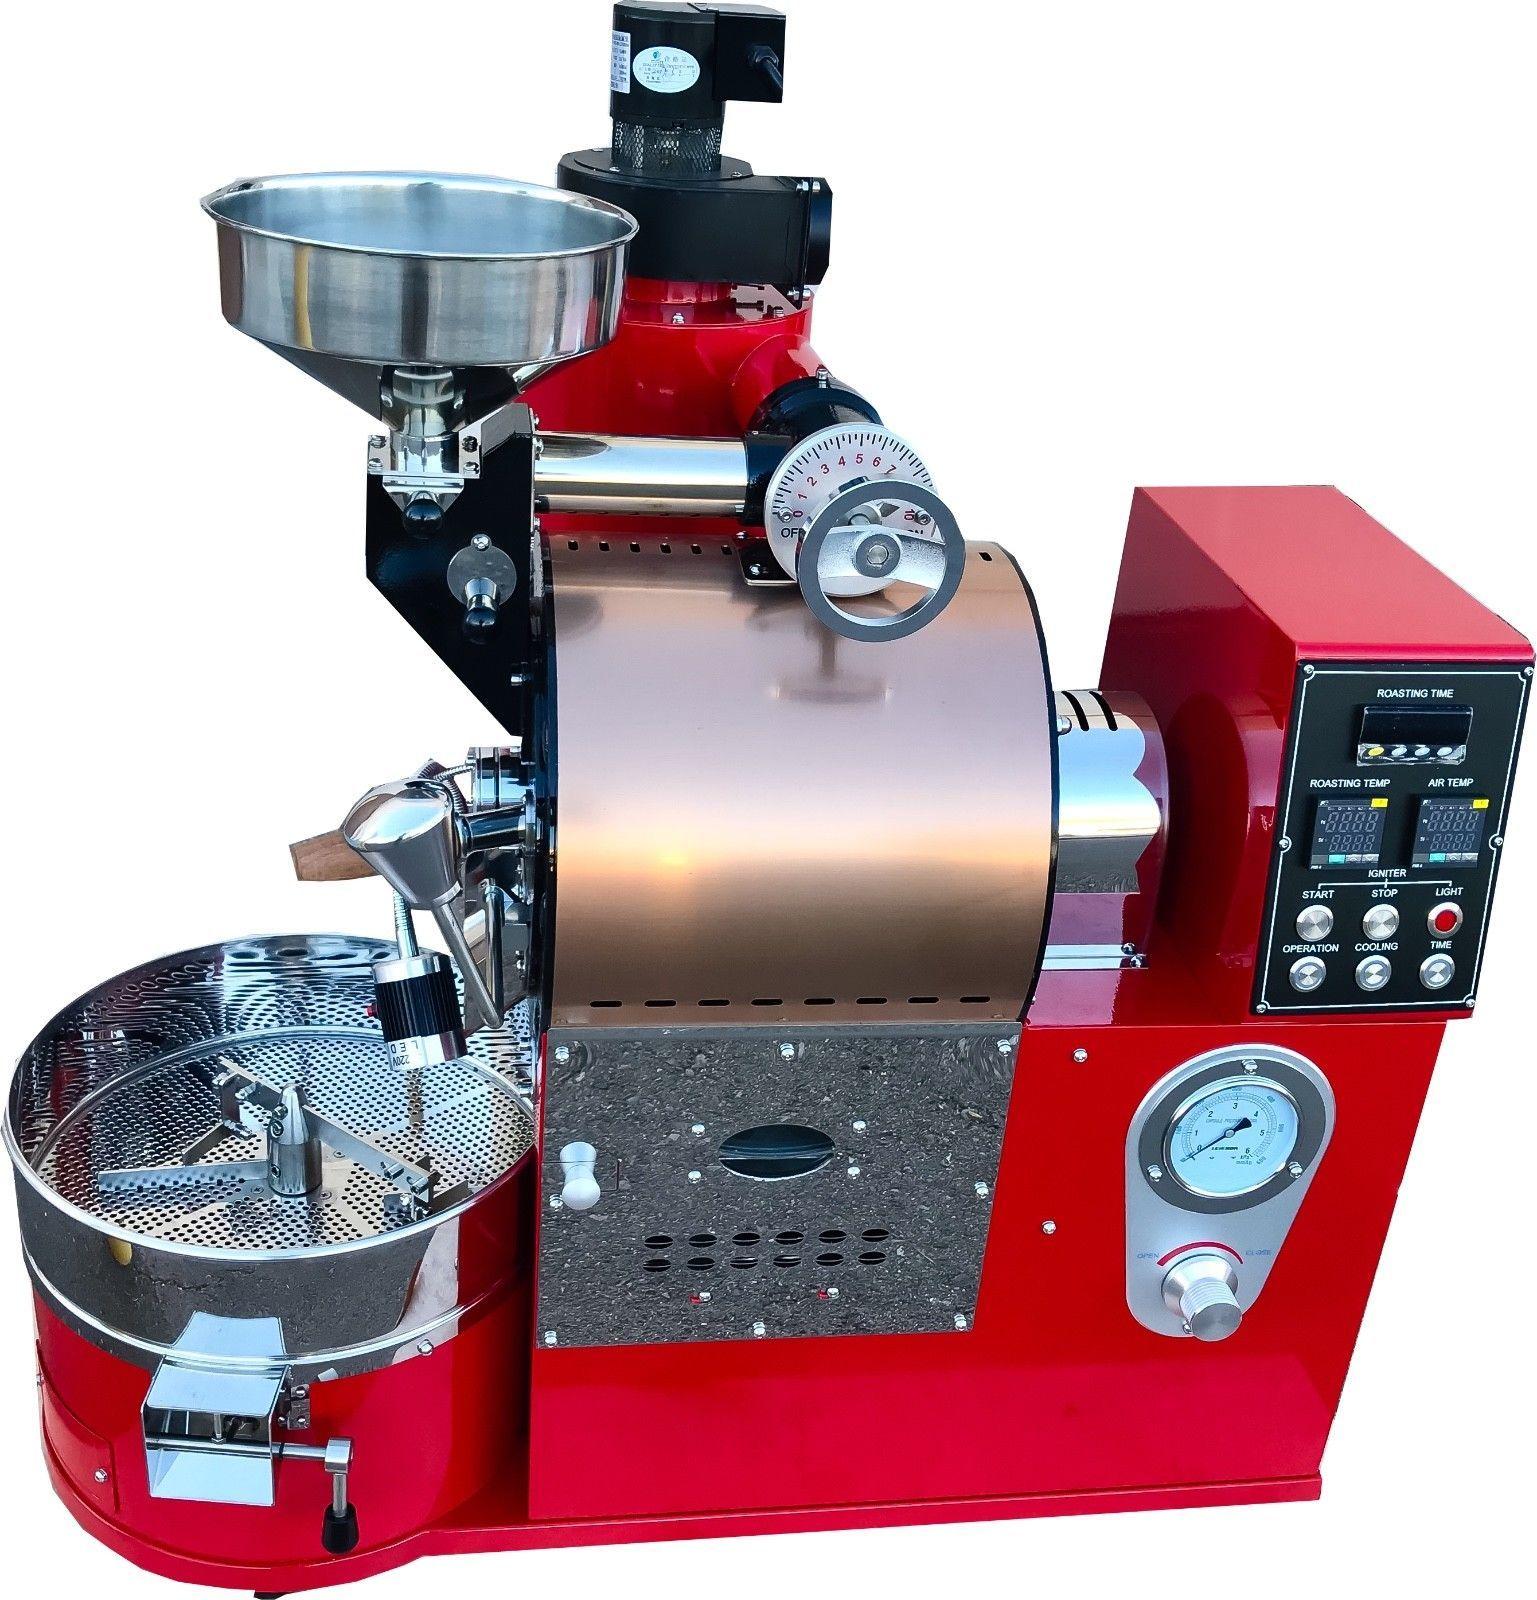 Coffee Roaster 4 lb Size Coffee grinder vintage, Coffee